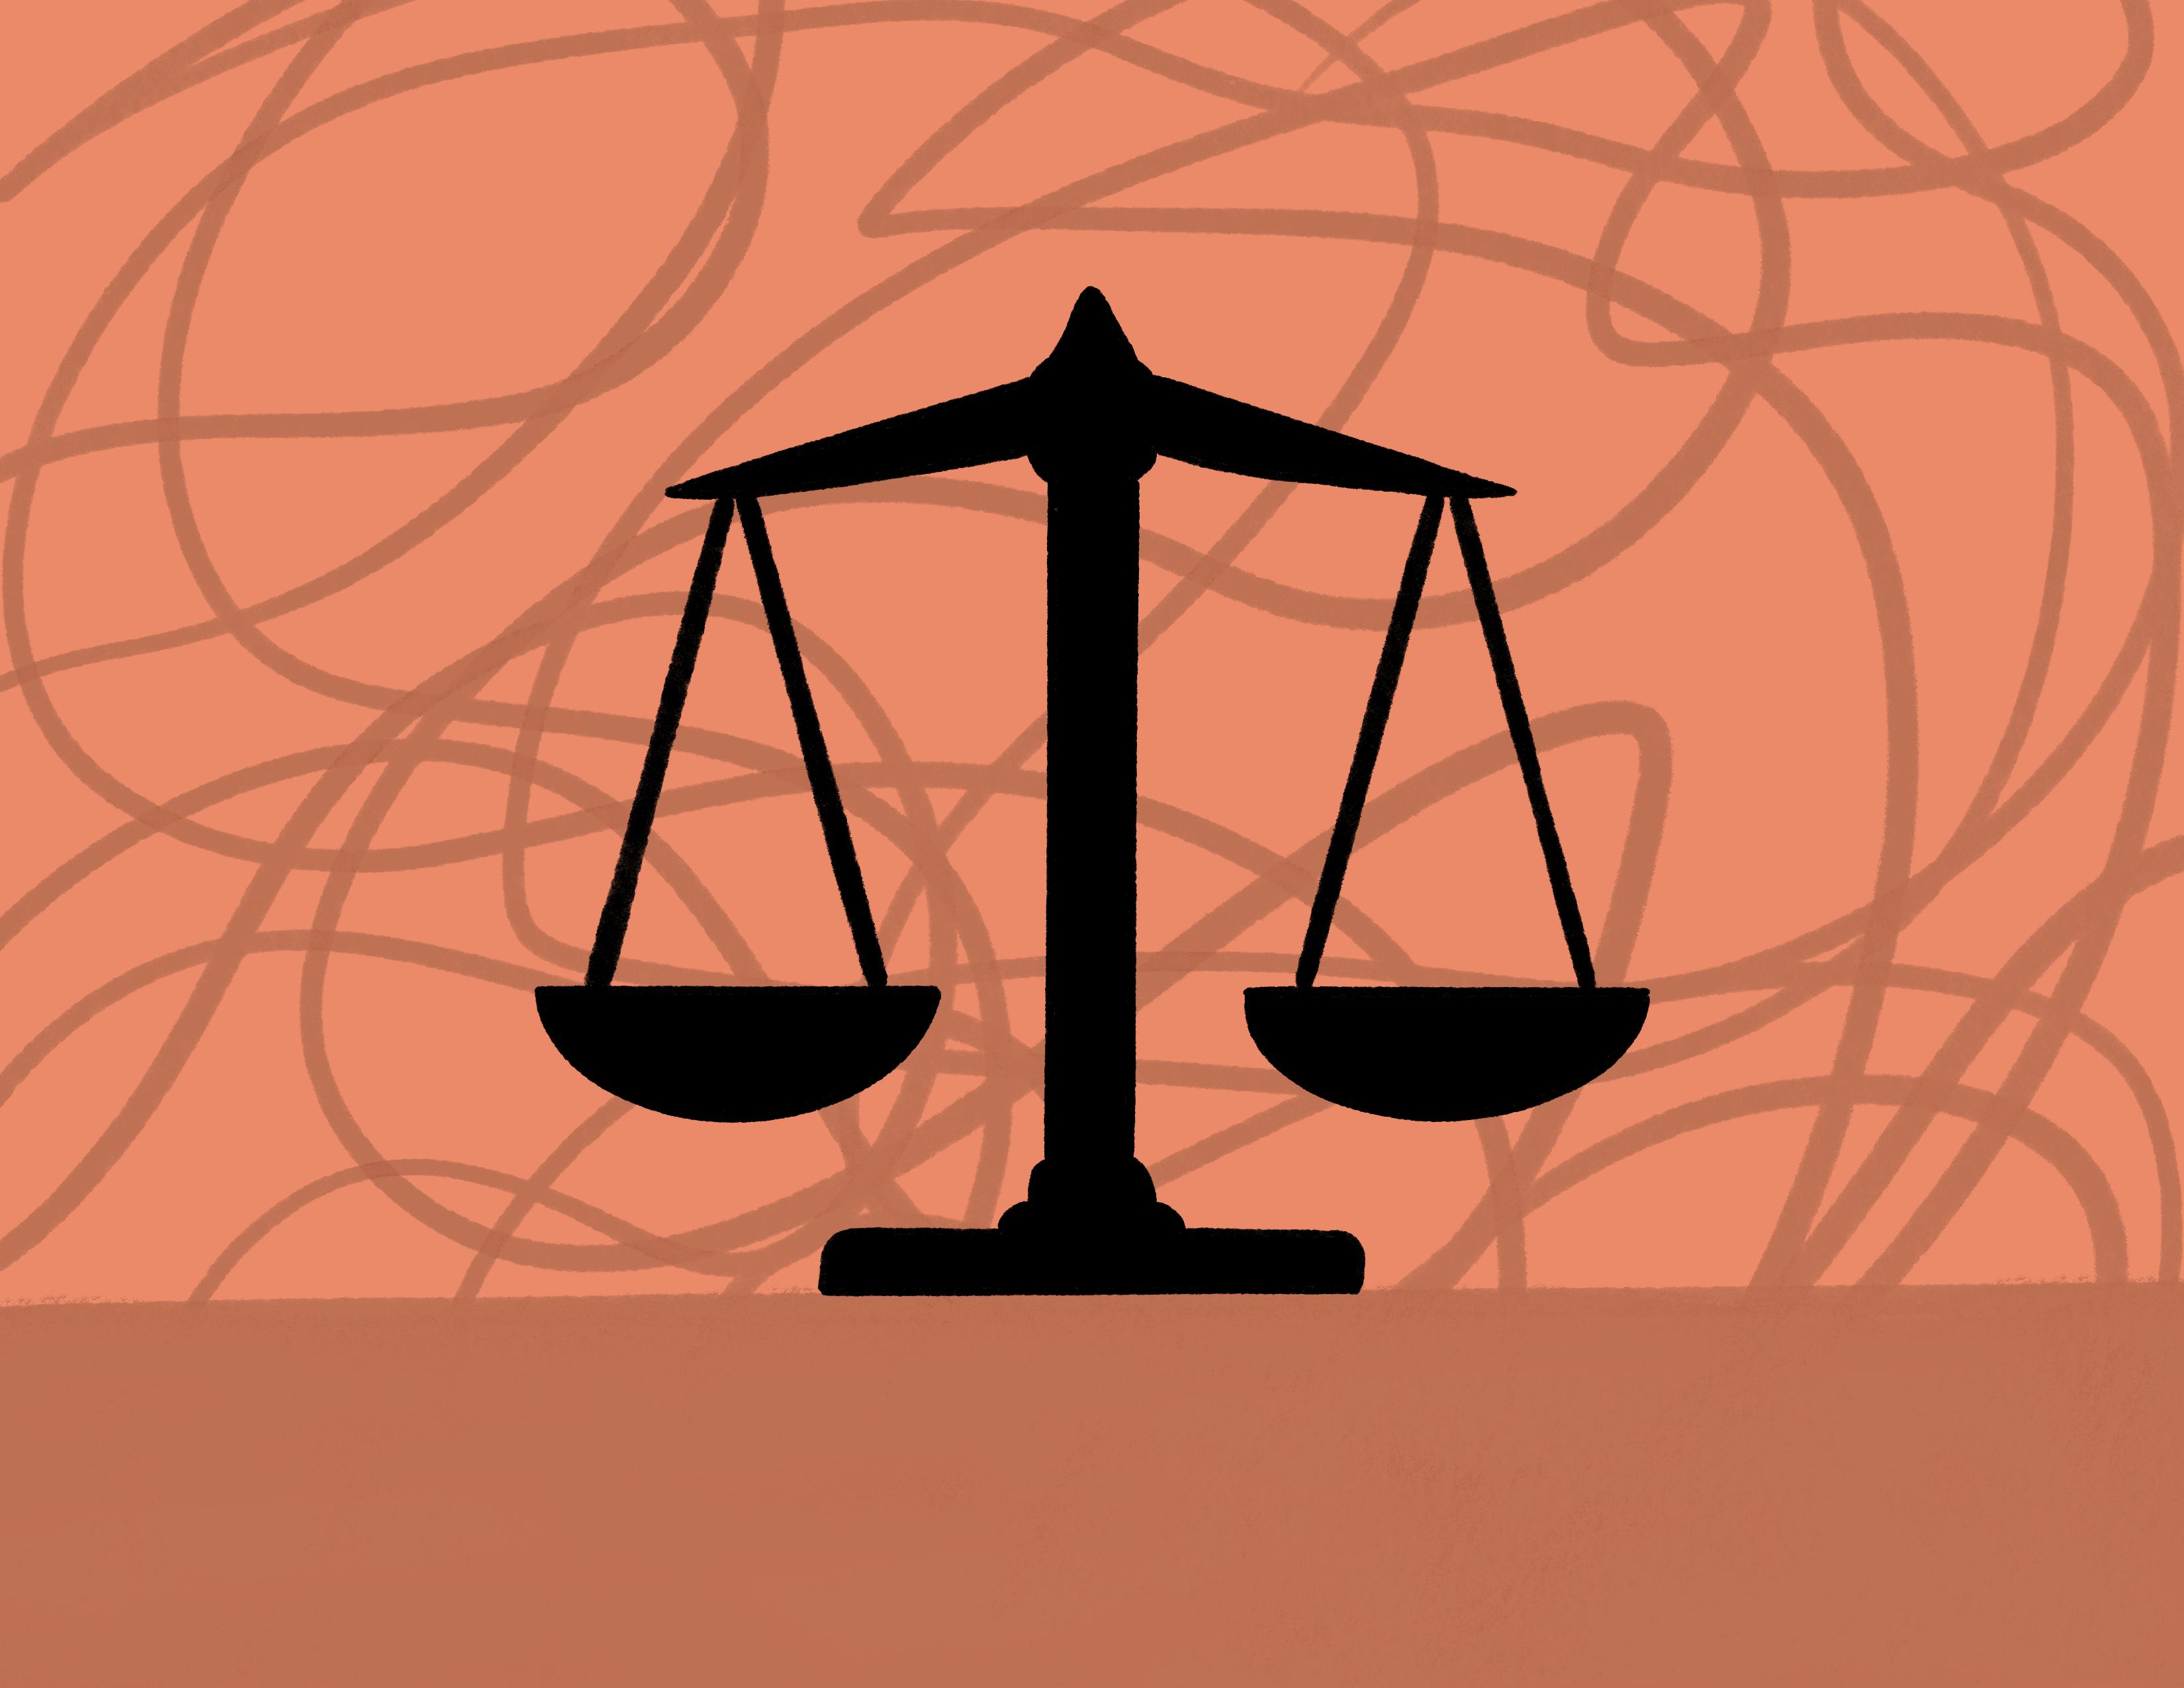 a scale representing balance